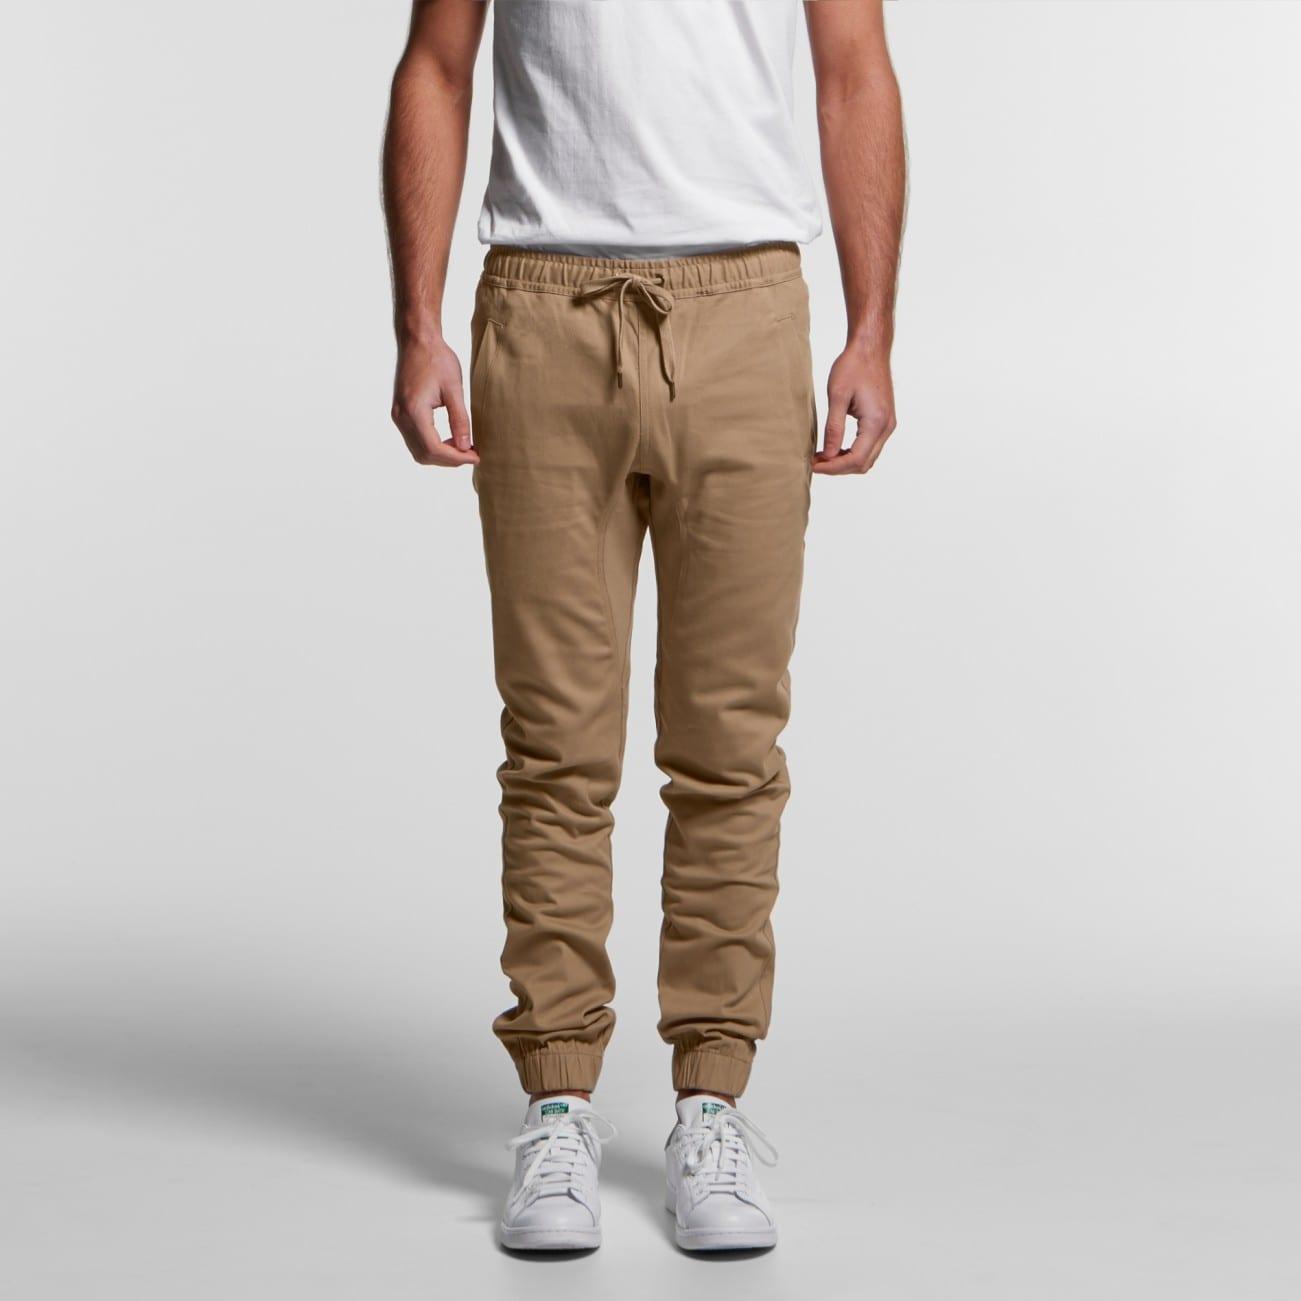 AS 5908 Cuff Pants